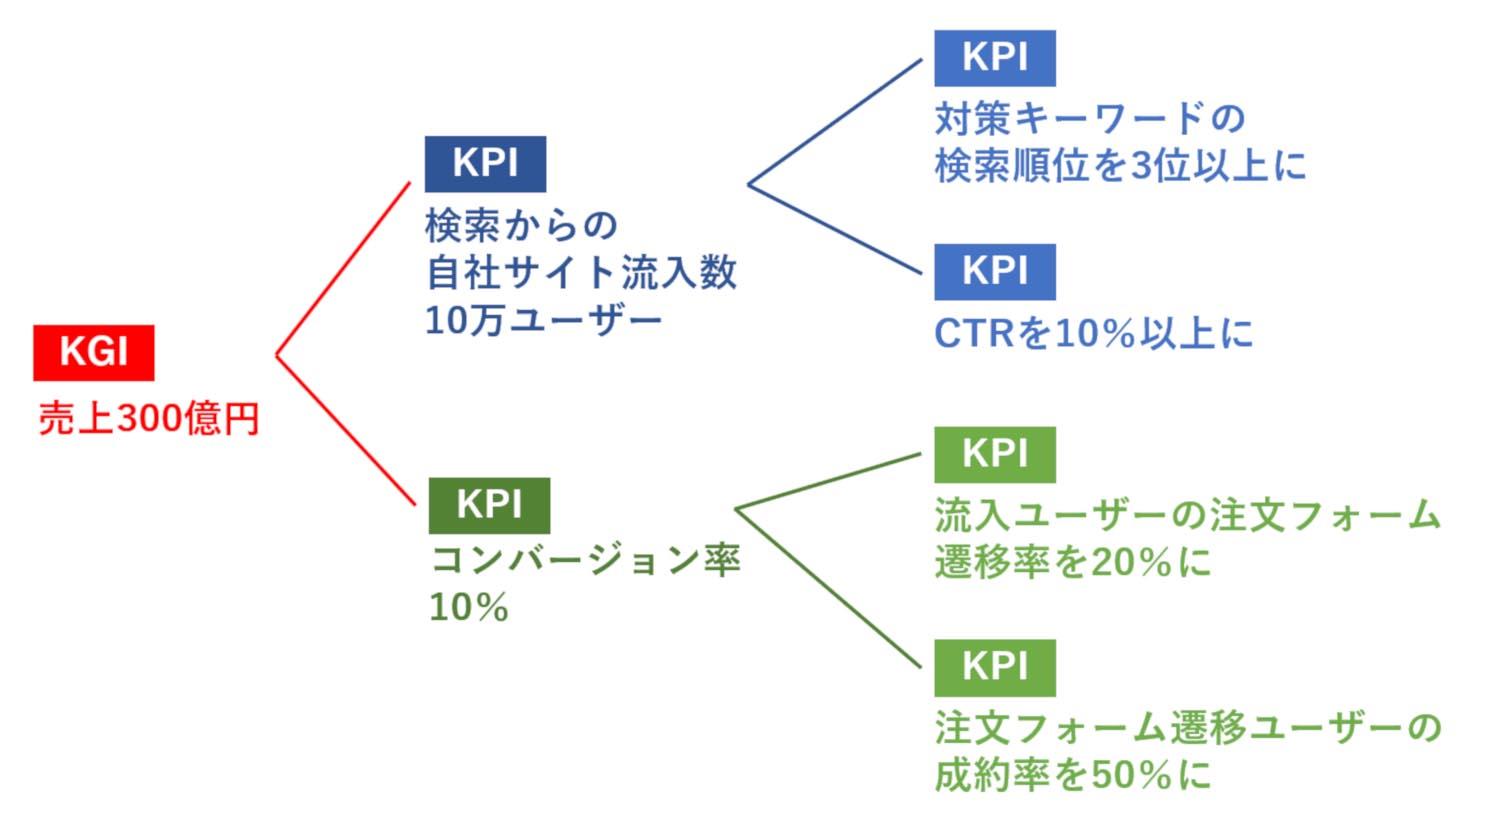 KGIとKPIの相関関係をツリー表示で可視化